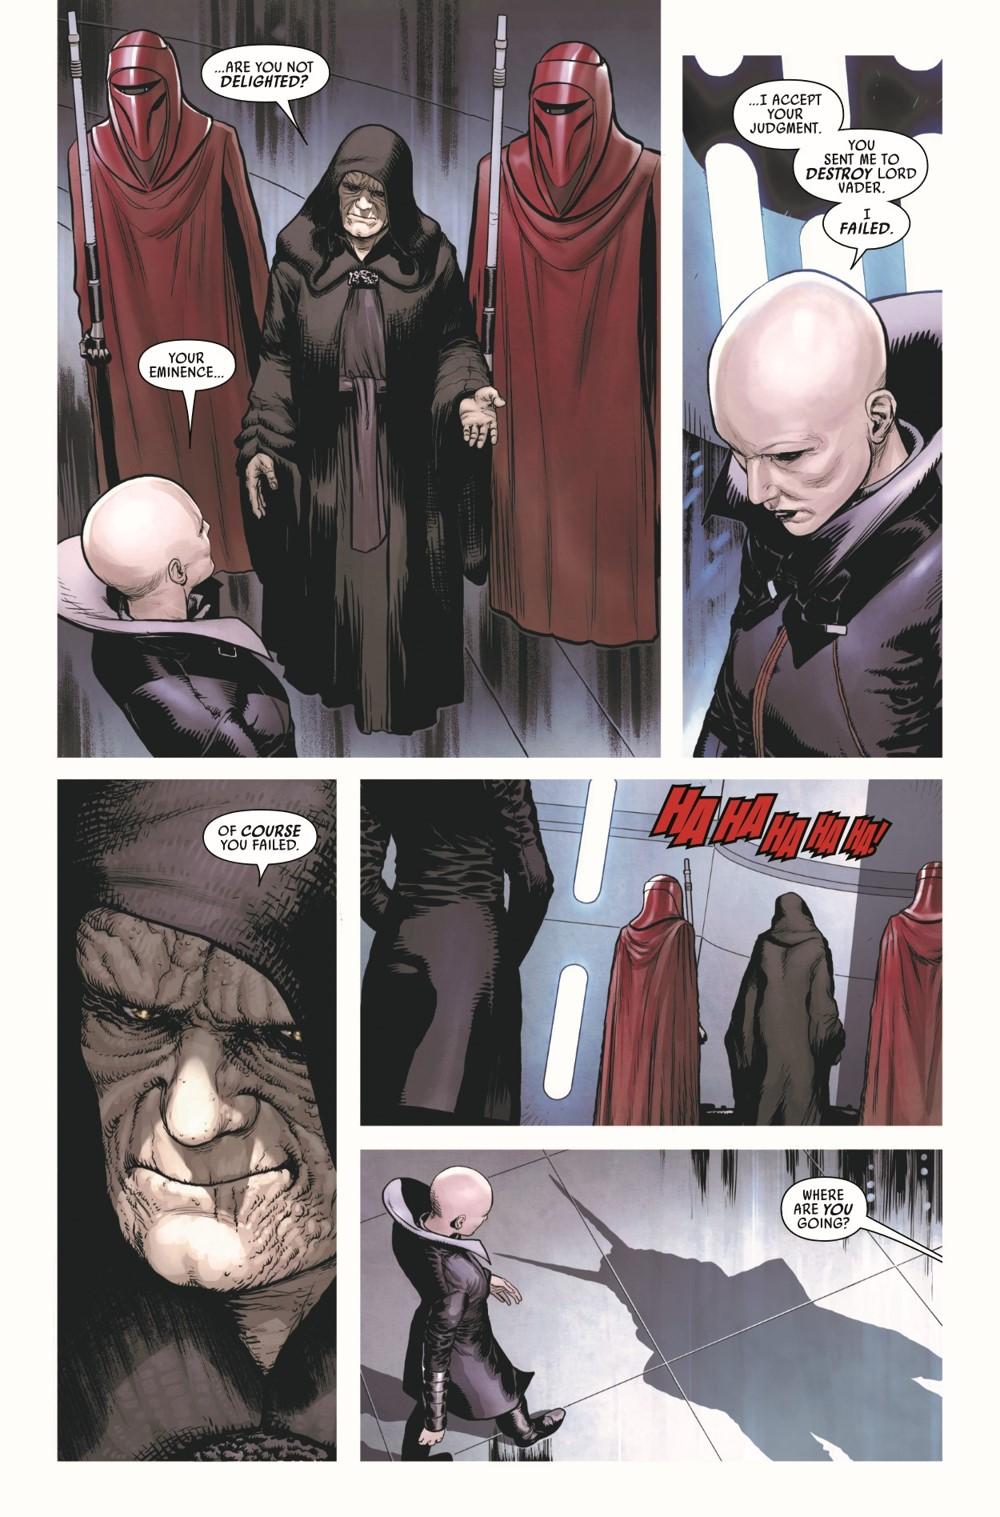 STWVADER2020014_Preview-4 ComicList Previews: STAR WARS DARTH VADER #14